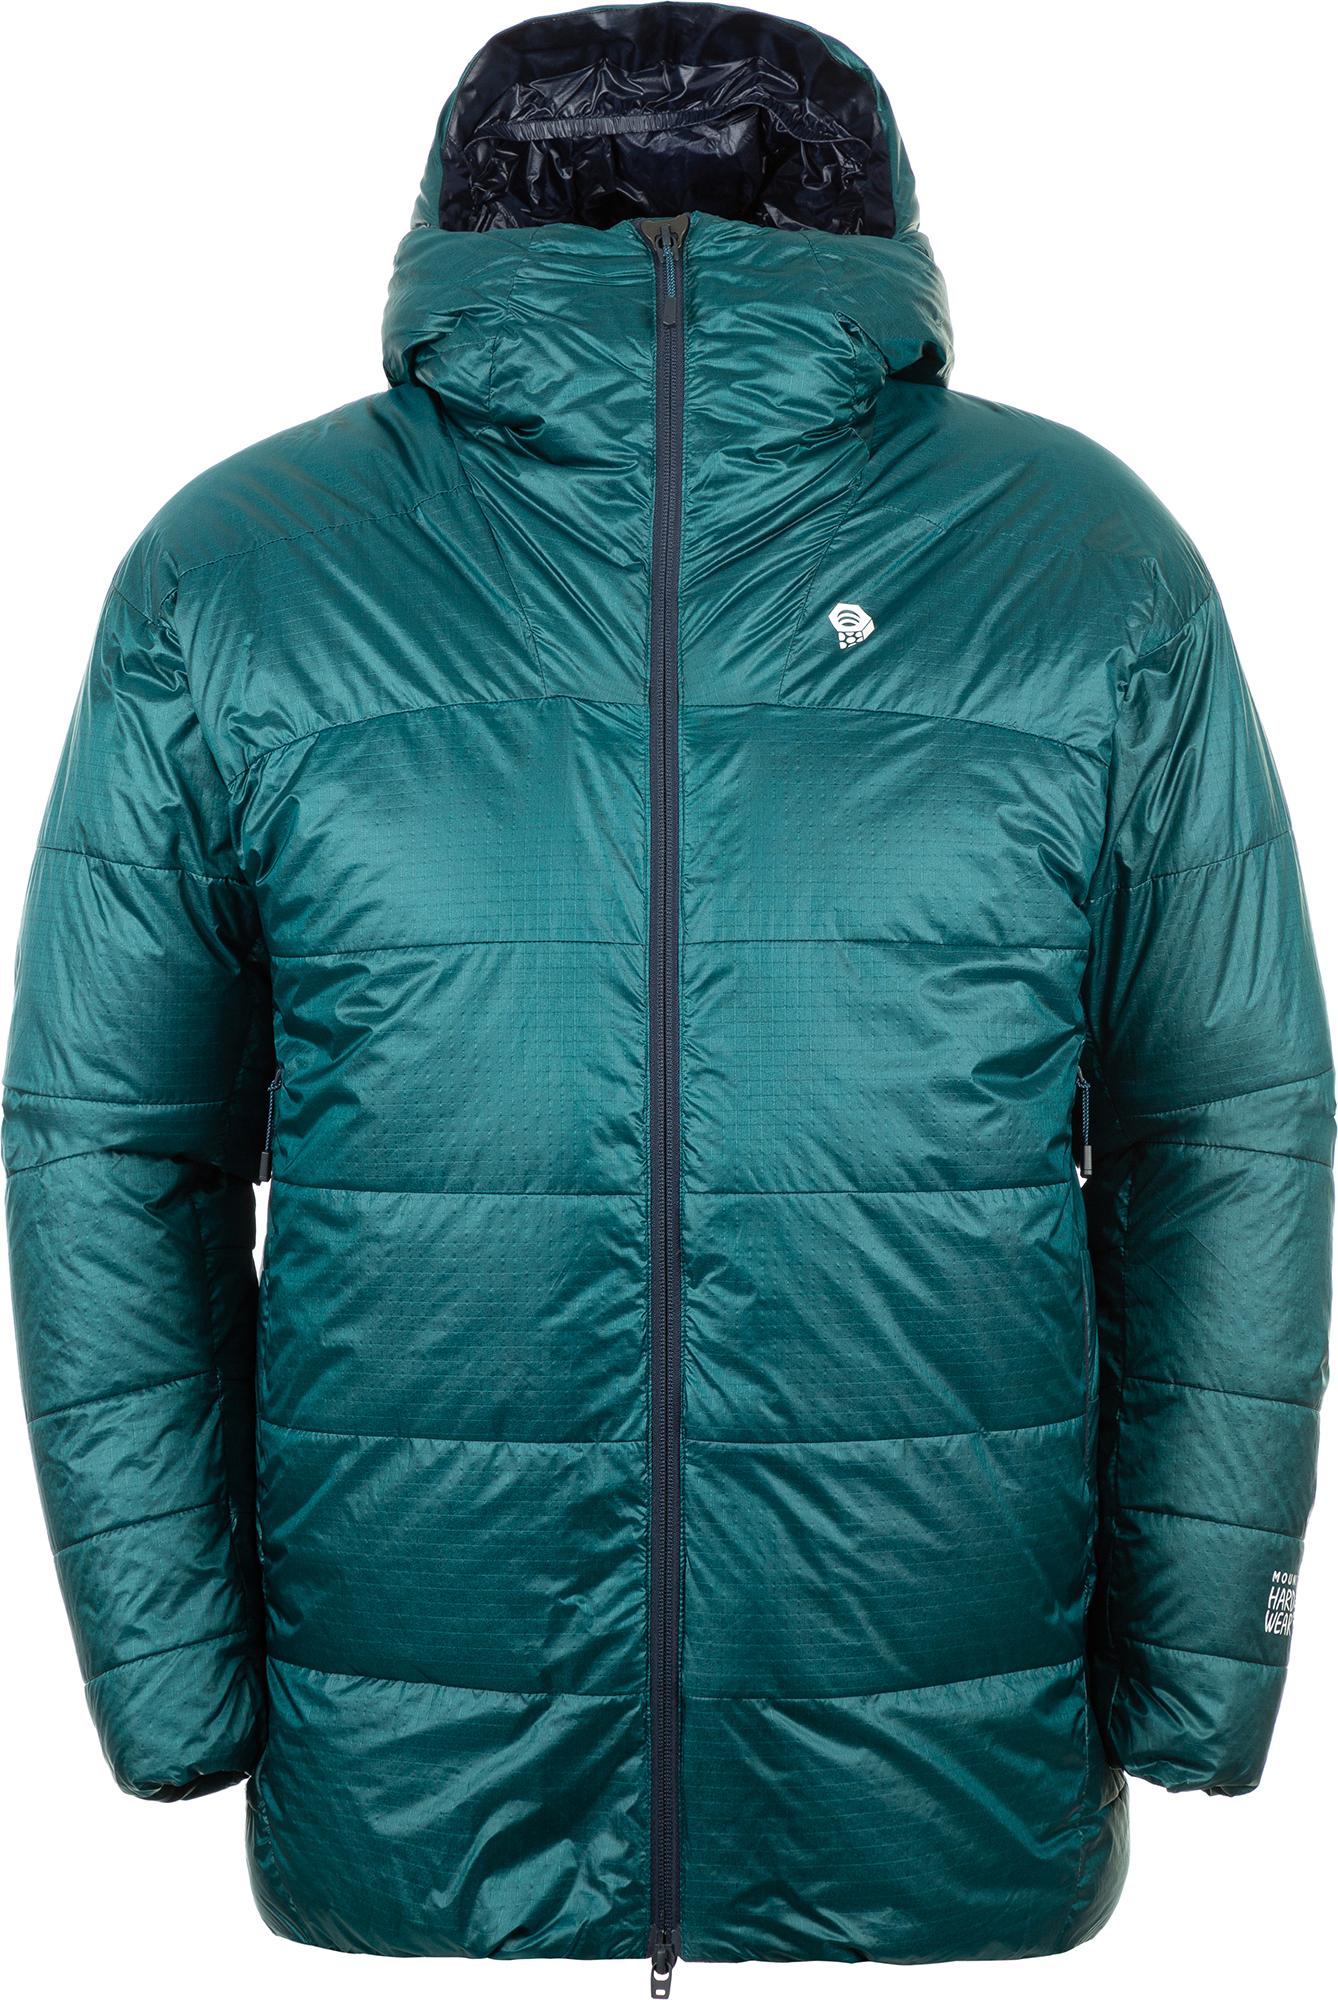 Mountain Hardwear Куртка пуховая мужская Mountain Hardwear Phantom™, размер 52 mountain hardwear футболка мужская mountain hardwear secret stash 2 размер 52